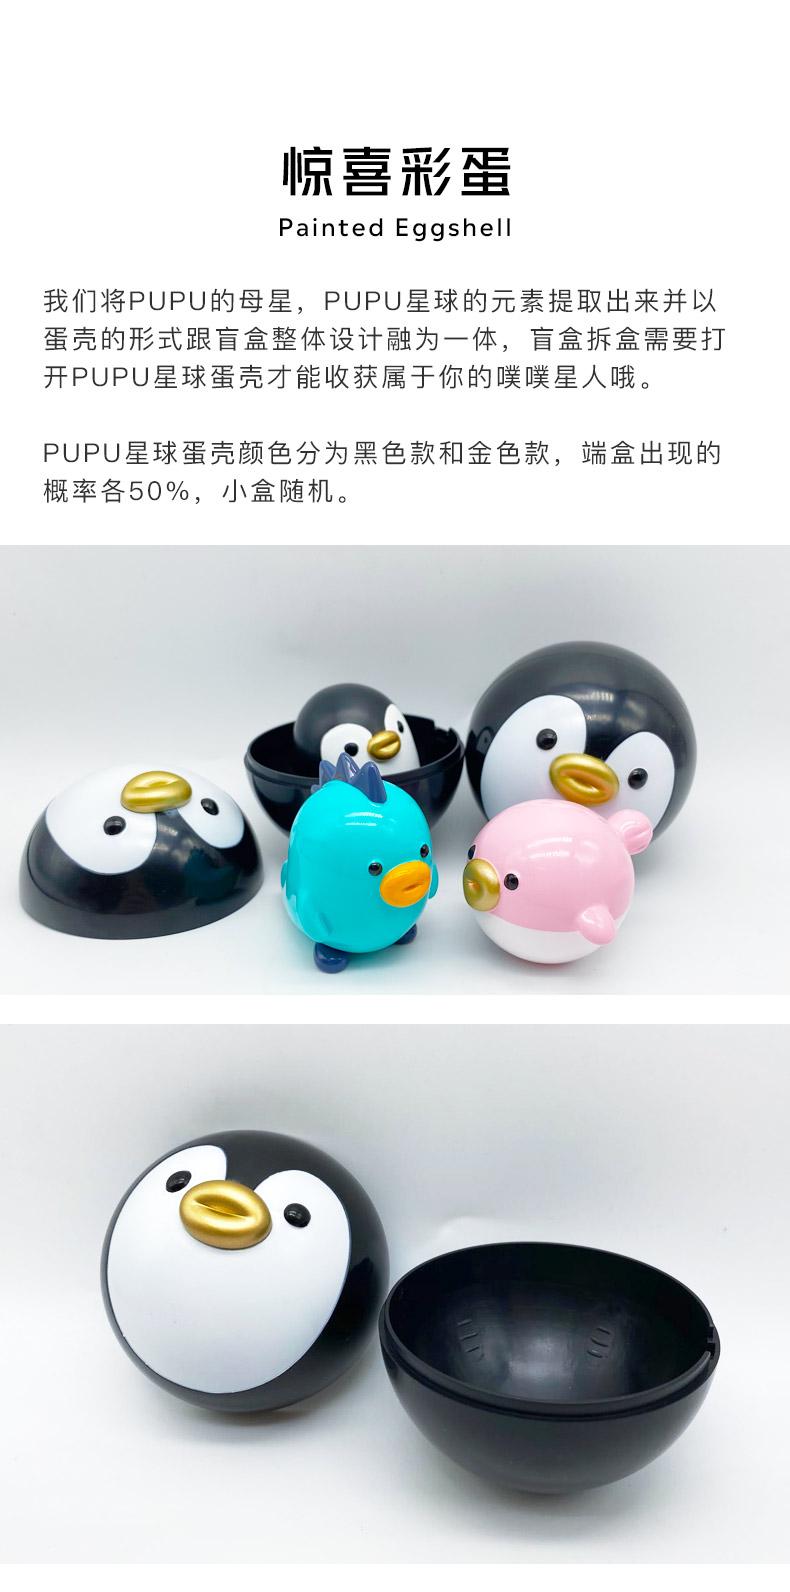 PUPU_06.jpg